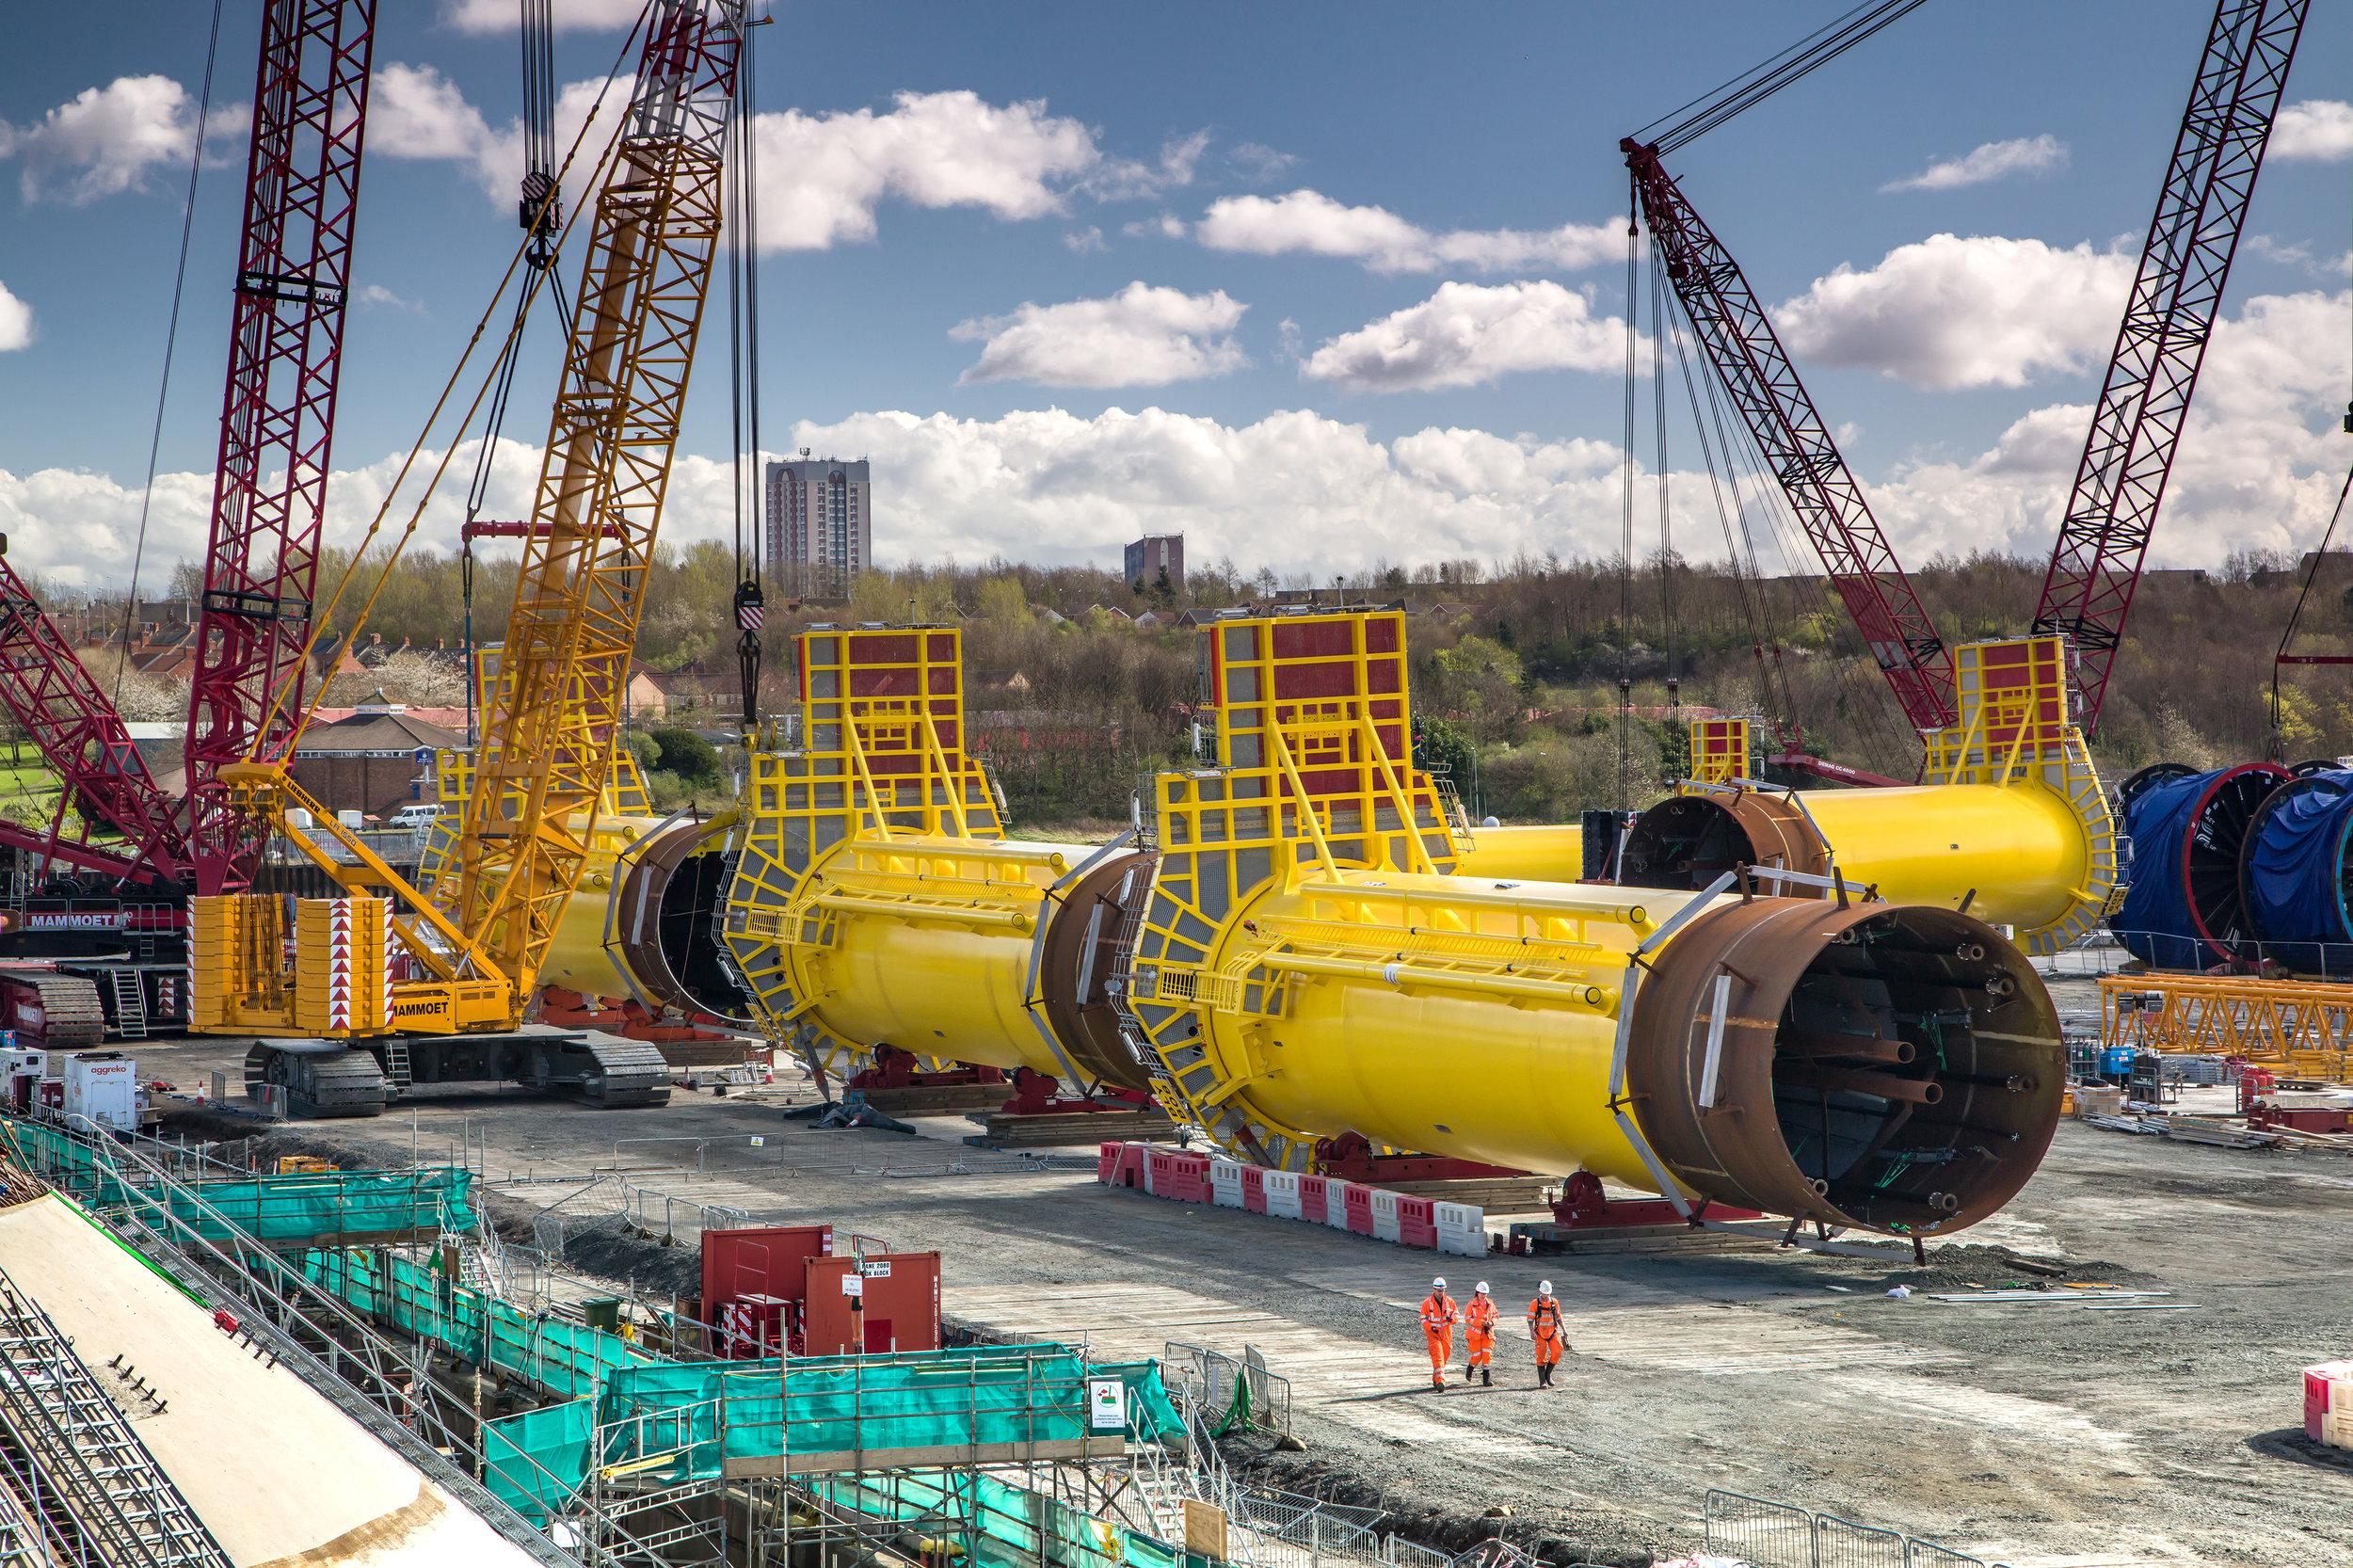 Windfarm base construction.